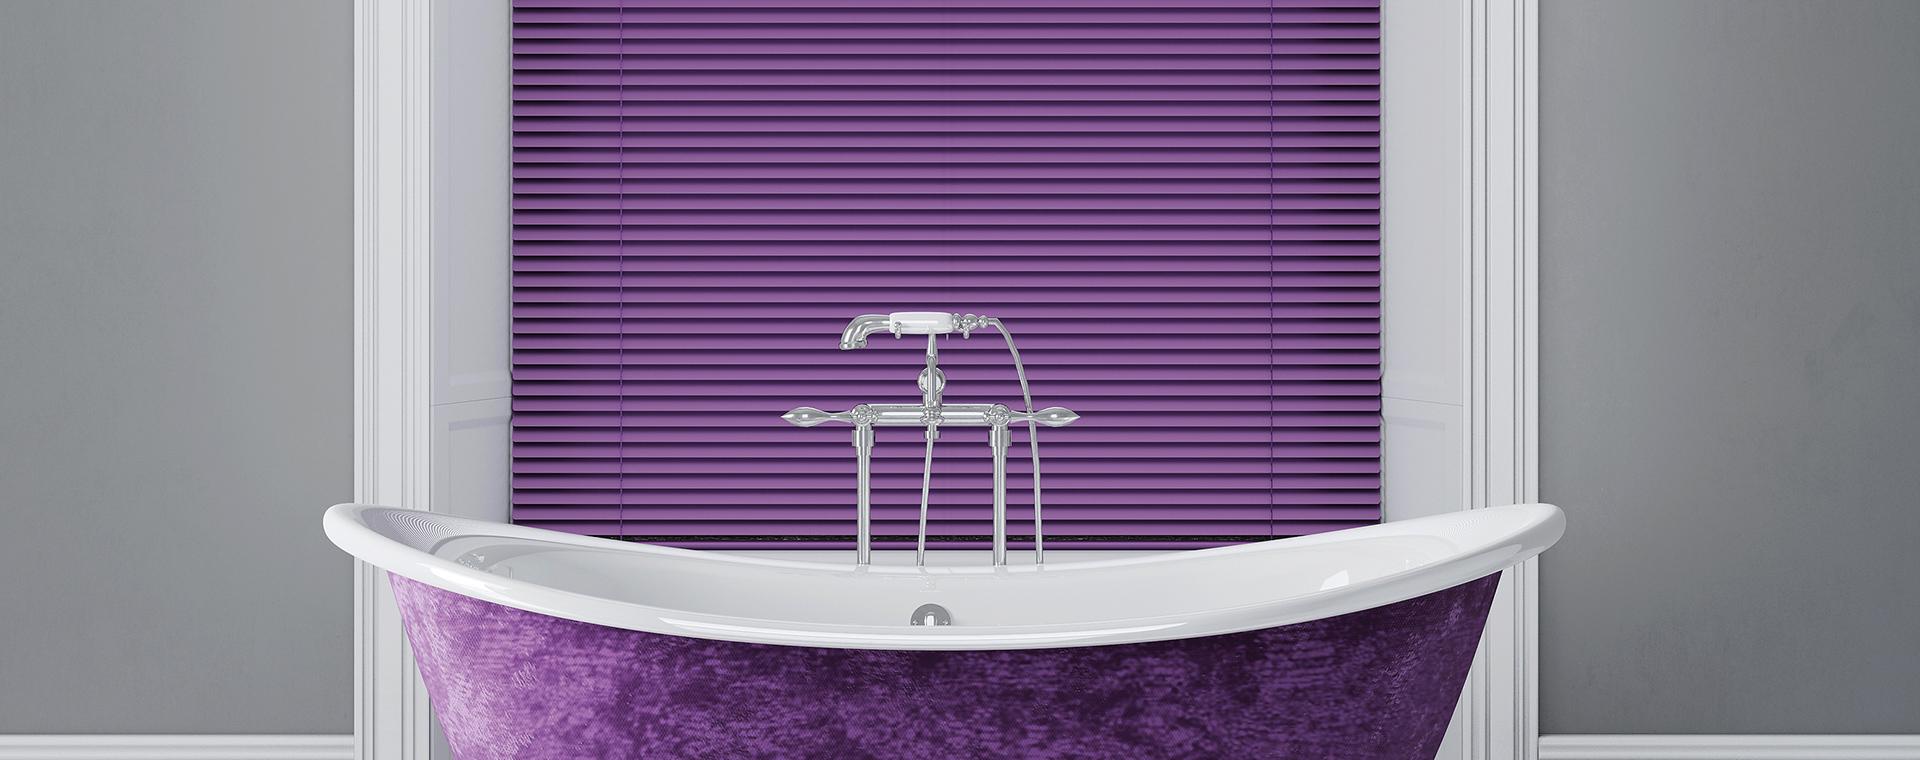 classic-blinds-belfast-home-slide3